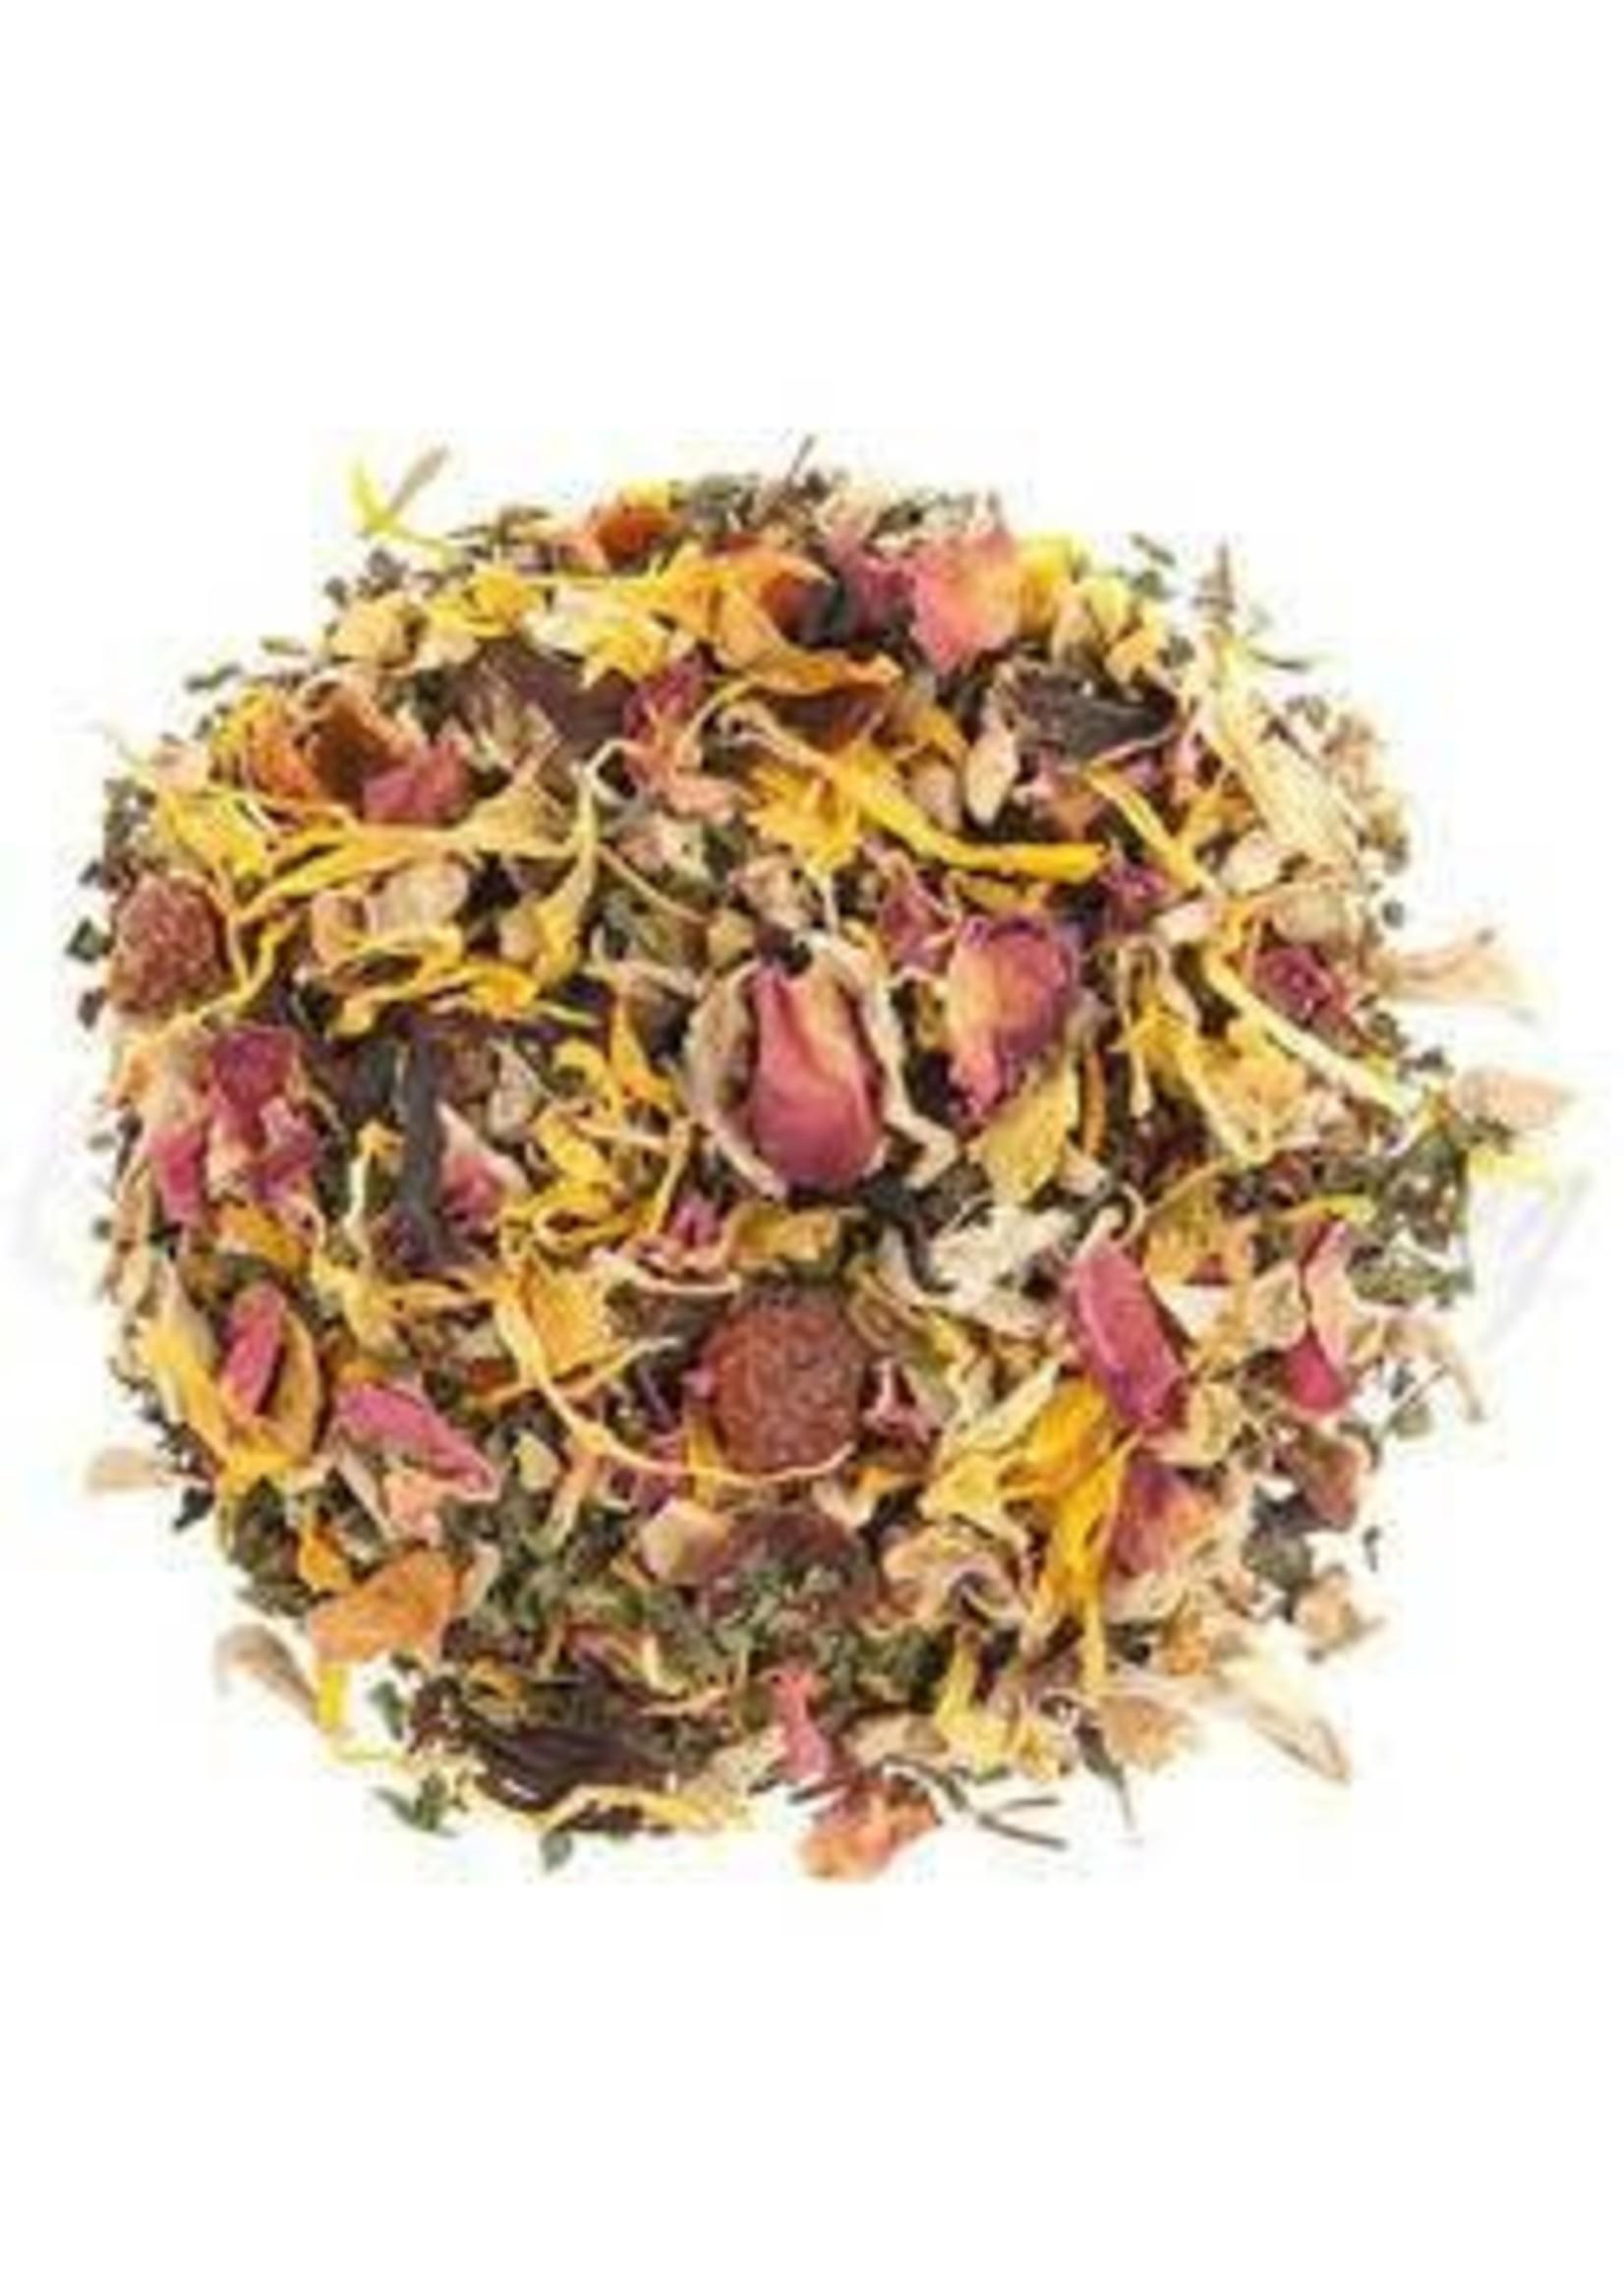 Geek Grind Meditations of the Yogi - Ayuredic Total Body Tea Blend - 3 oz Loose Tea